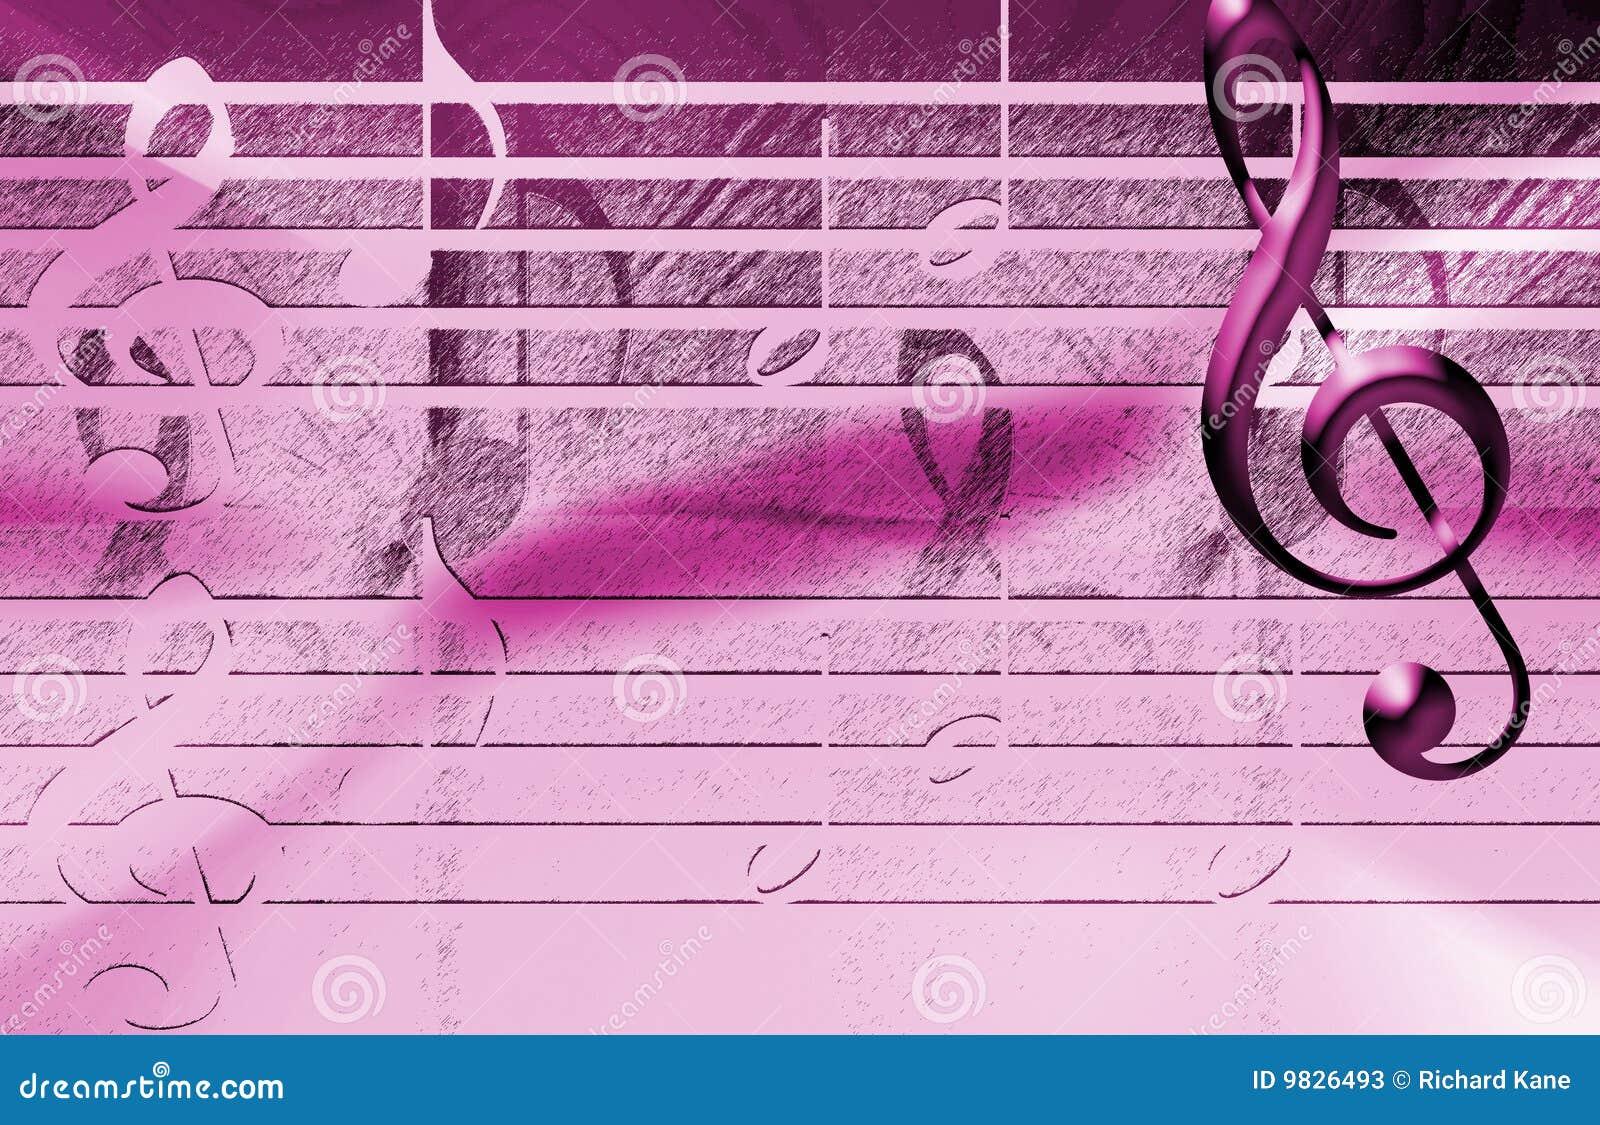 Pink Music Wallpaper: Pink Music Background Stock Illustration. Image Of